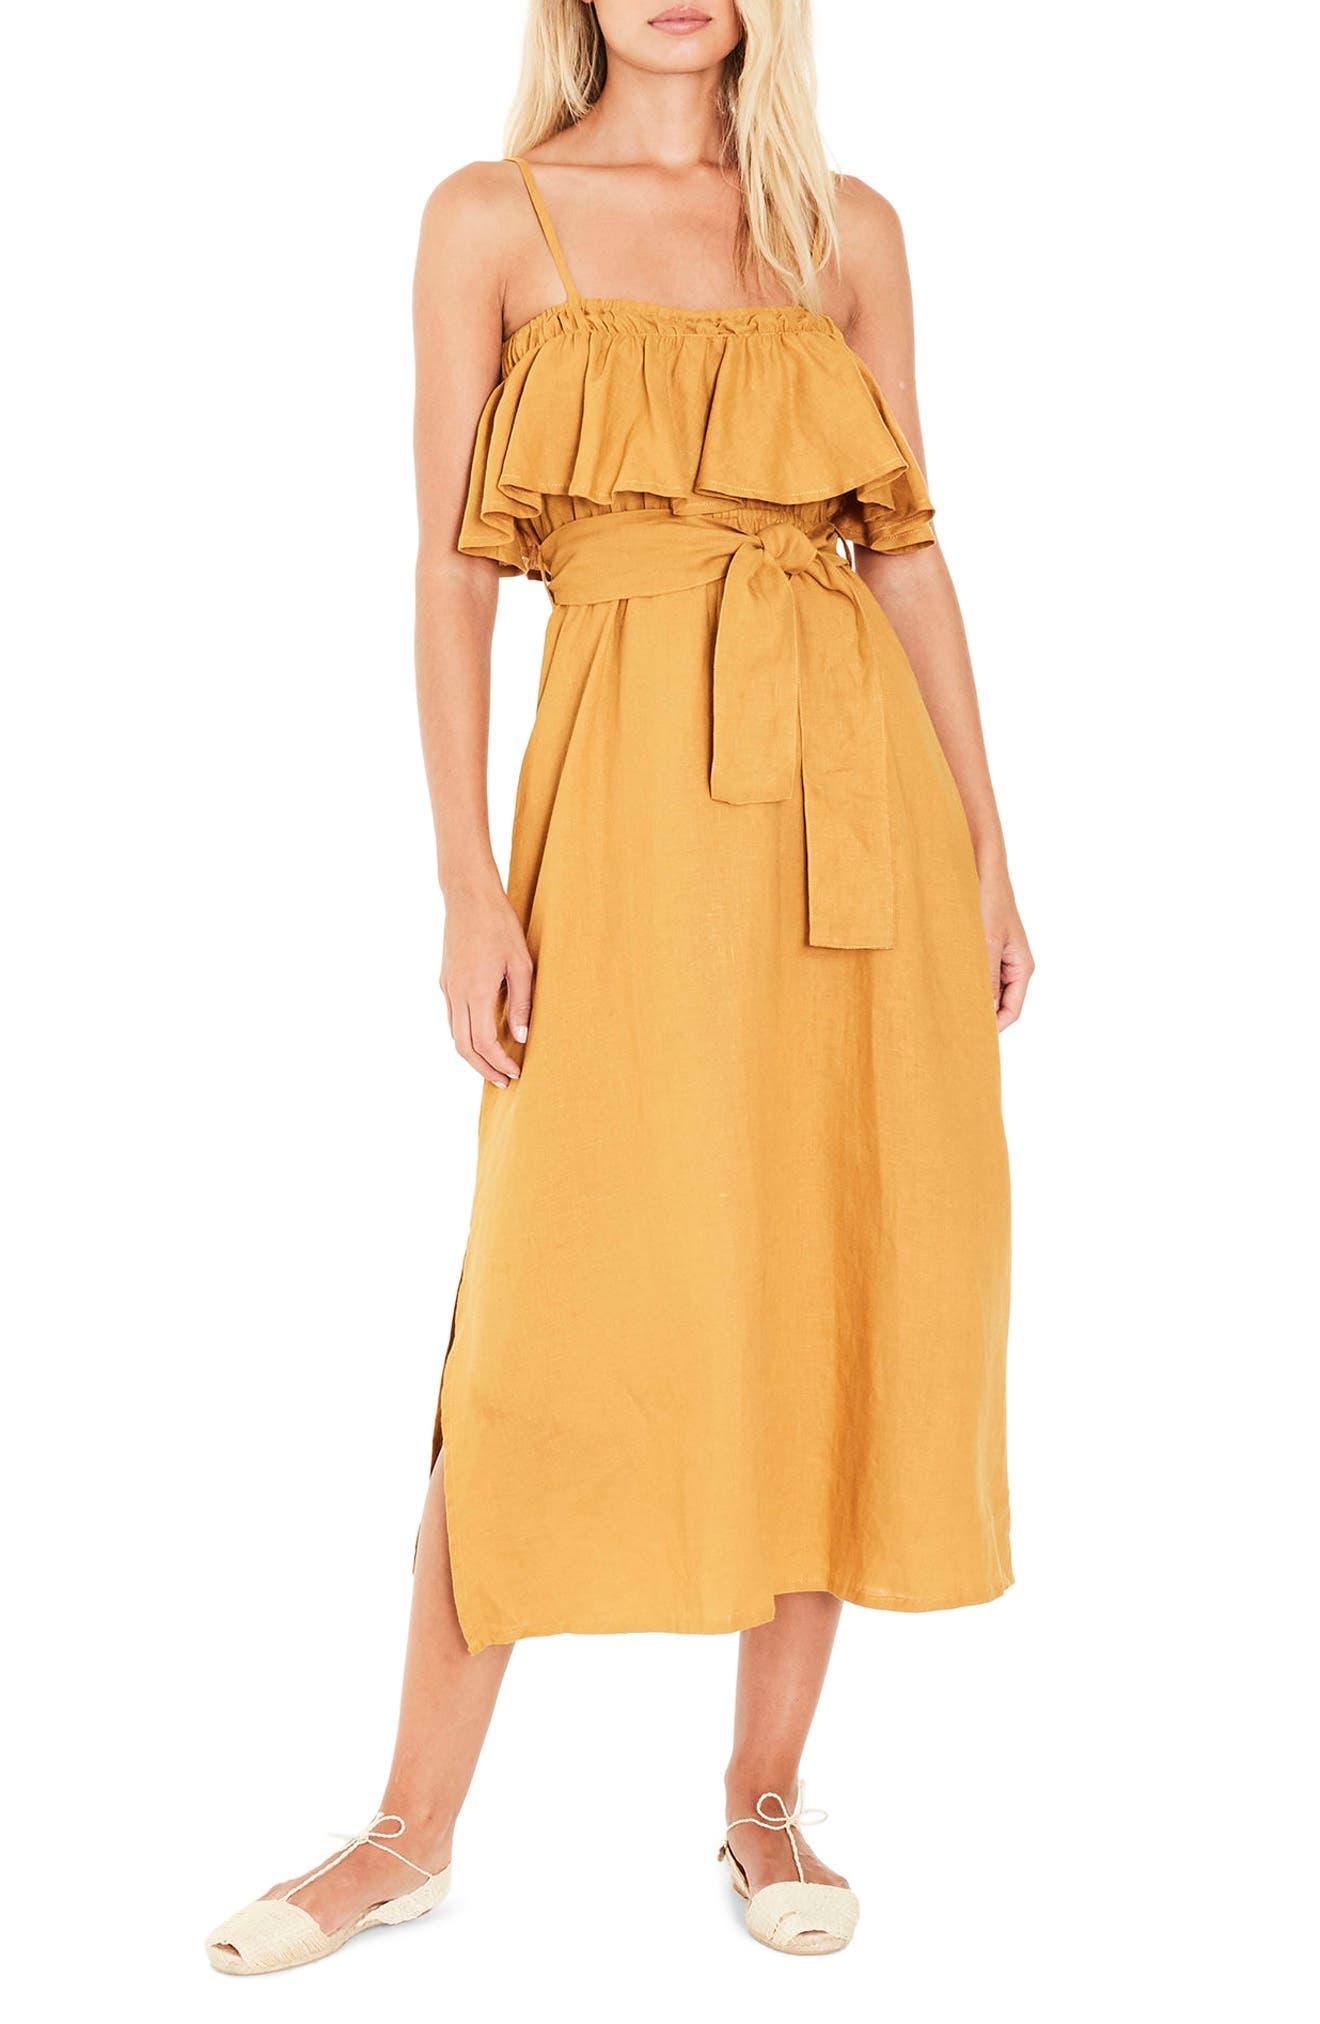 FAITHFULL THE BRAND Santo Linen Midi Dress